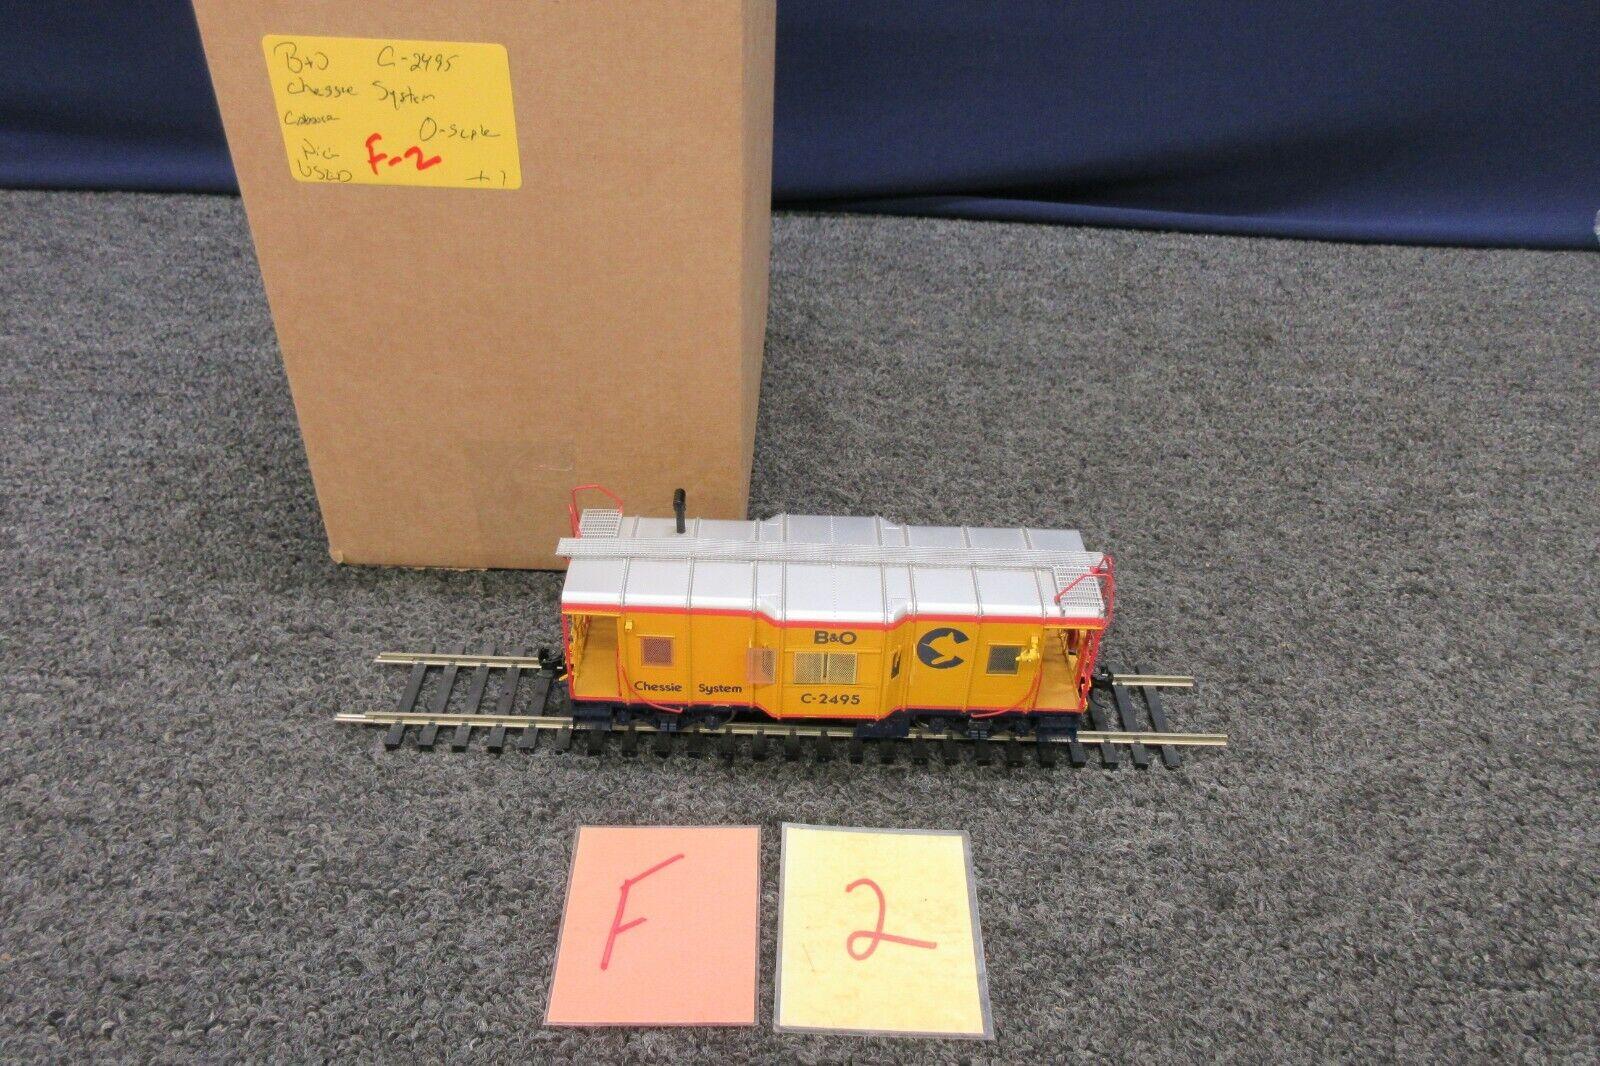 Chessie System Train B&O C2495 Caboose auto OGauge Scale Kadee